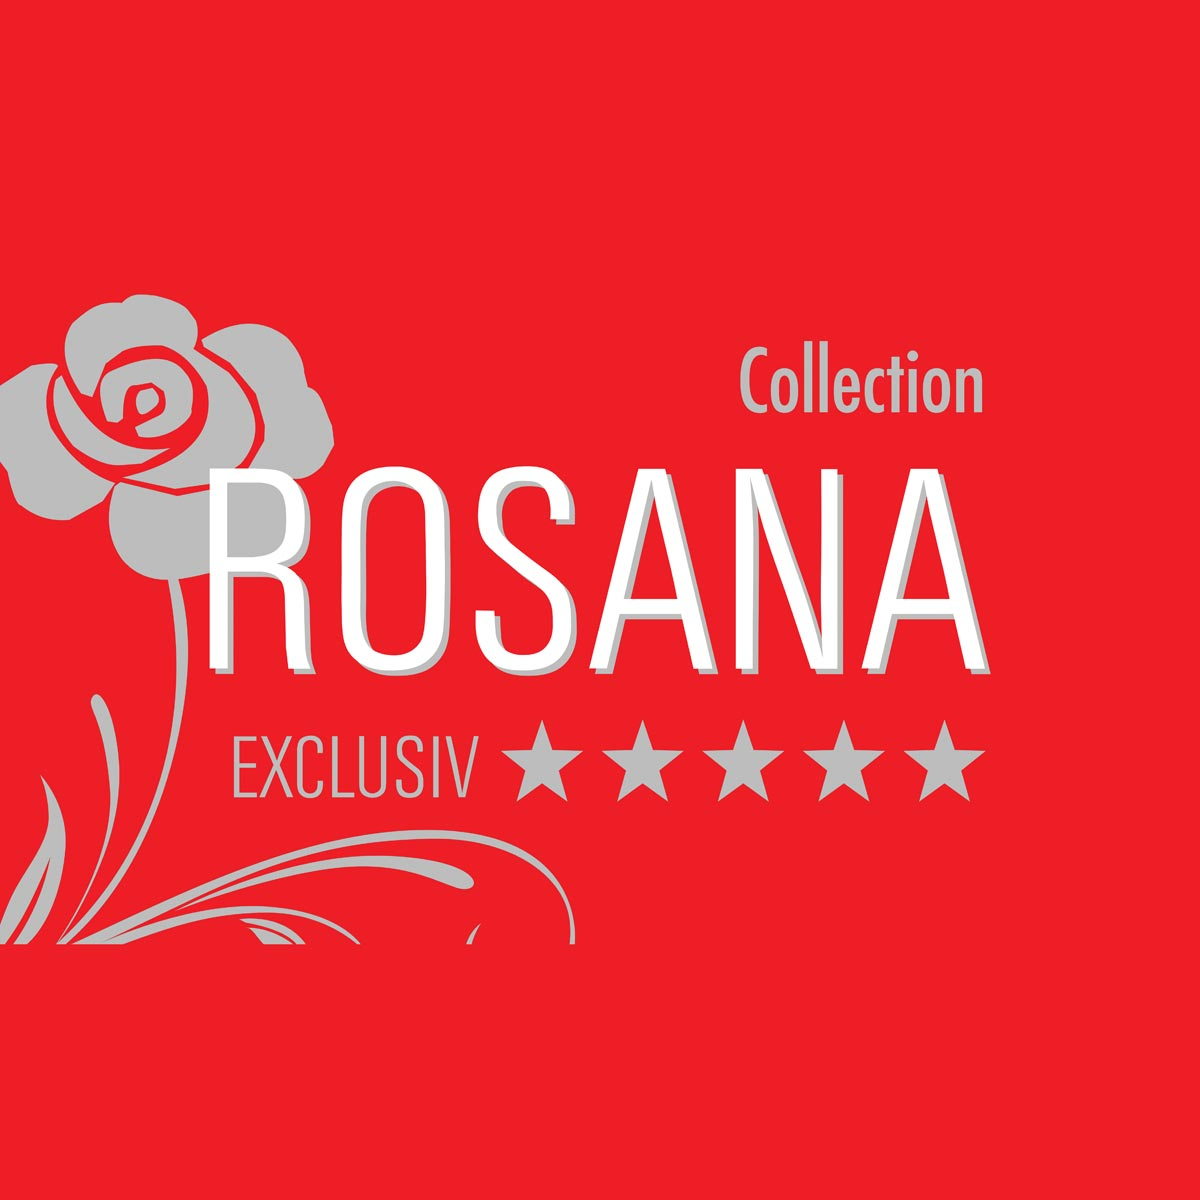 schlafstil kassettendecke rosana medium 100 daunen g nstig online kaufen bei bettwaren shop. Black Bedroom Furniture Sets. Home Design Ideas